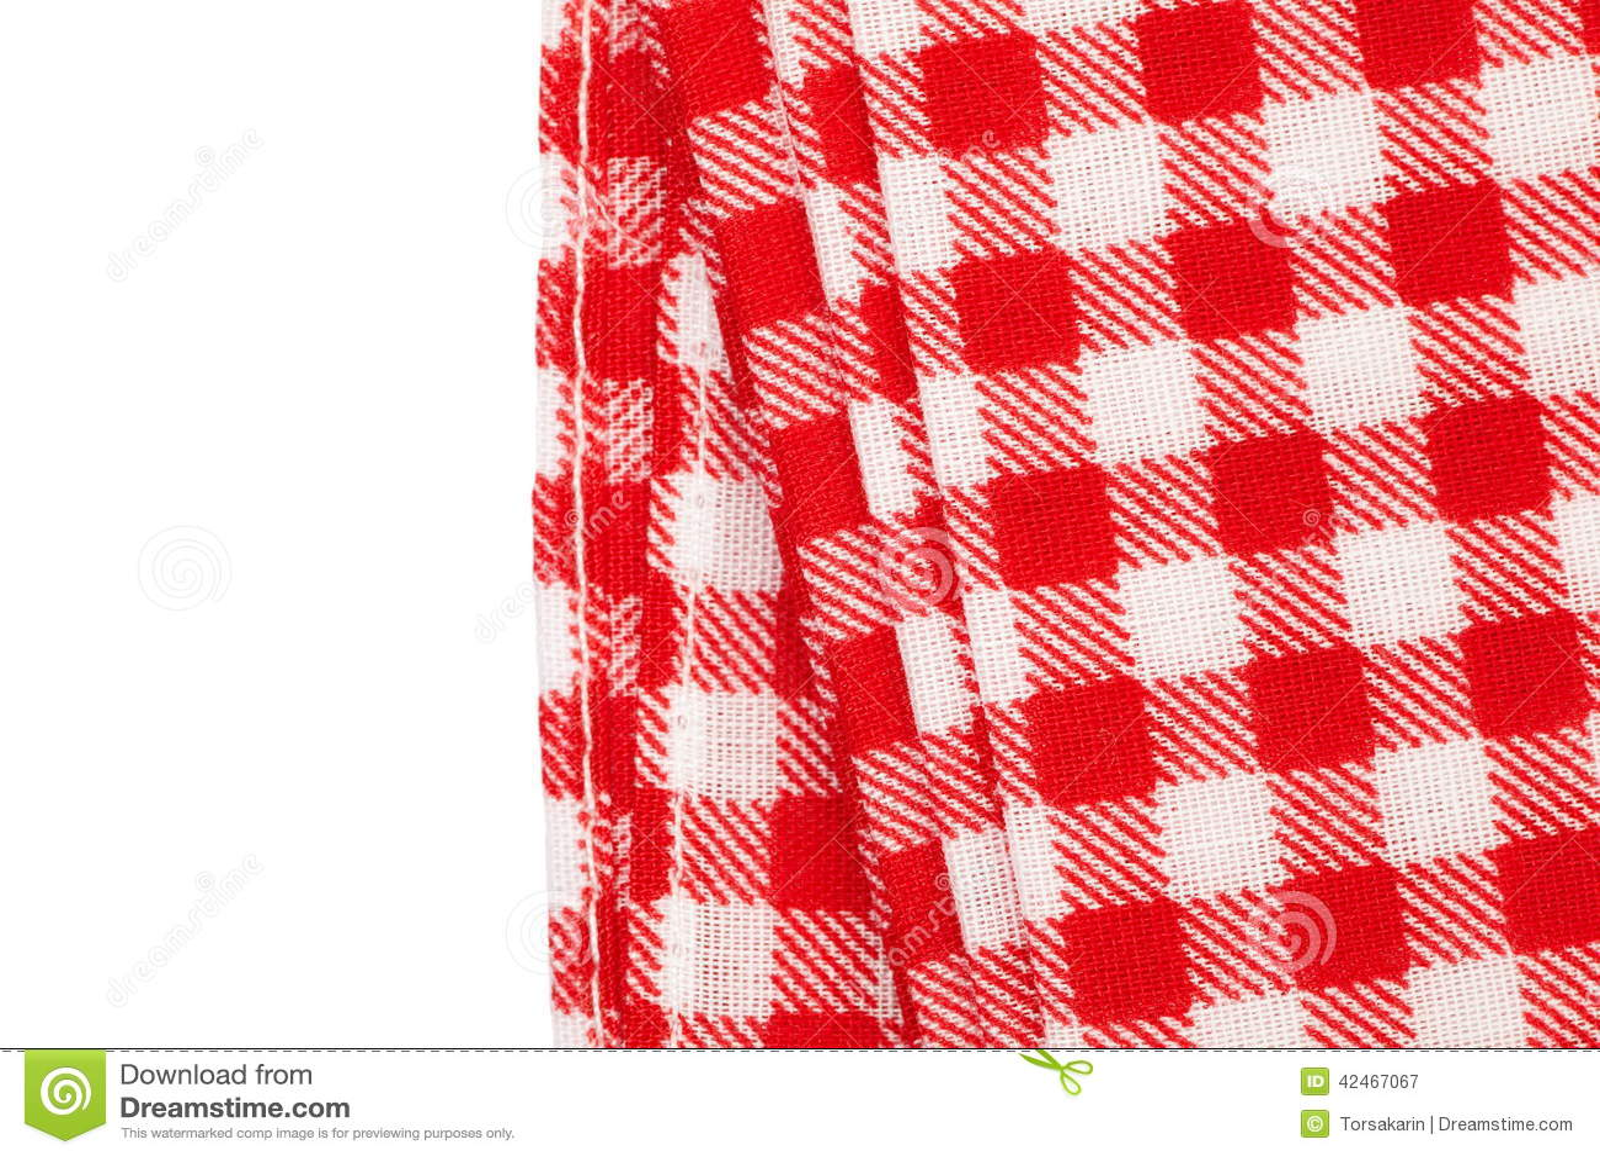 Picknicktischdecke kariert